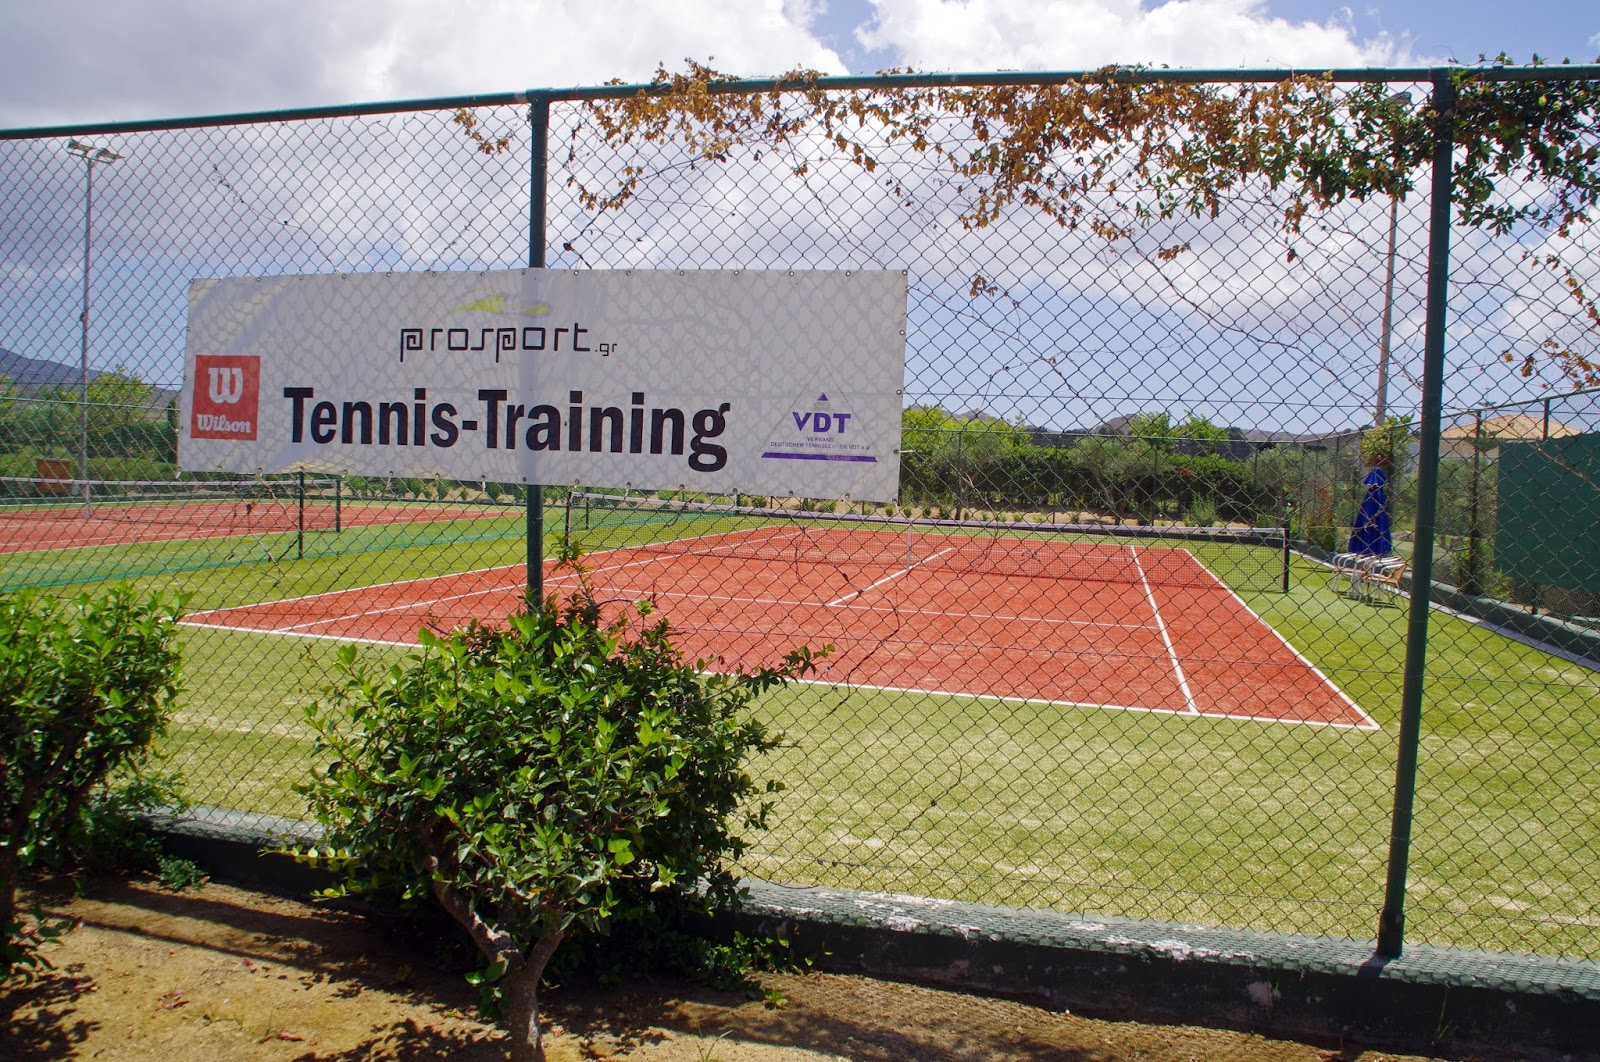 Neptune Hotel Kos Tennis Court